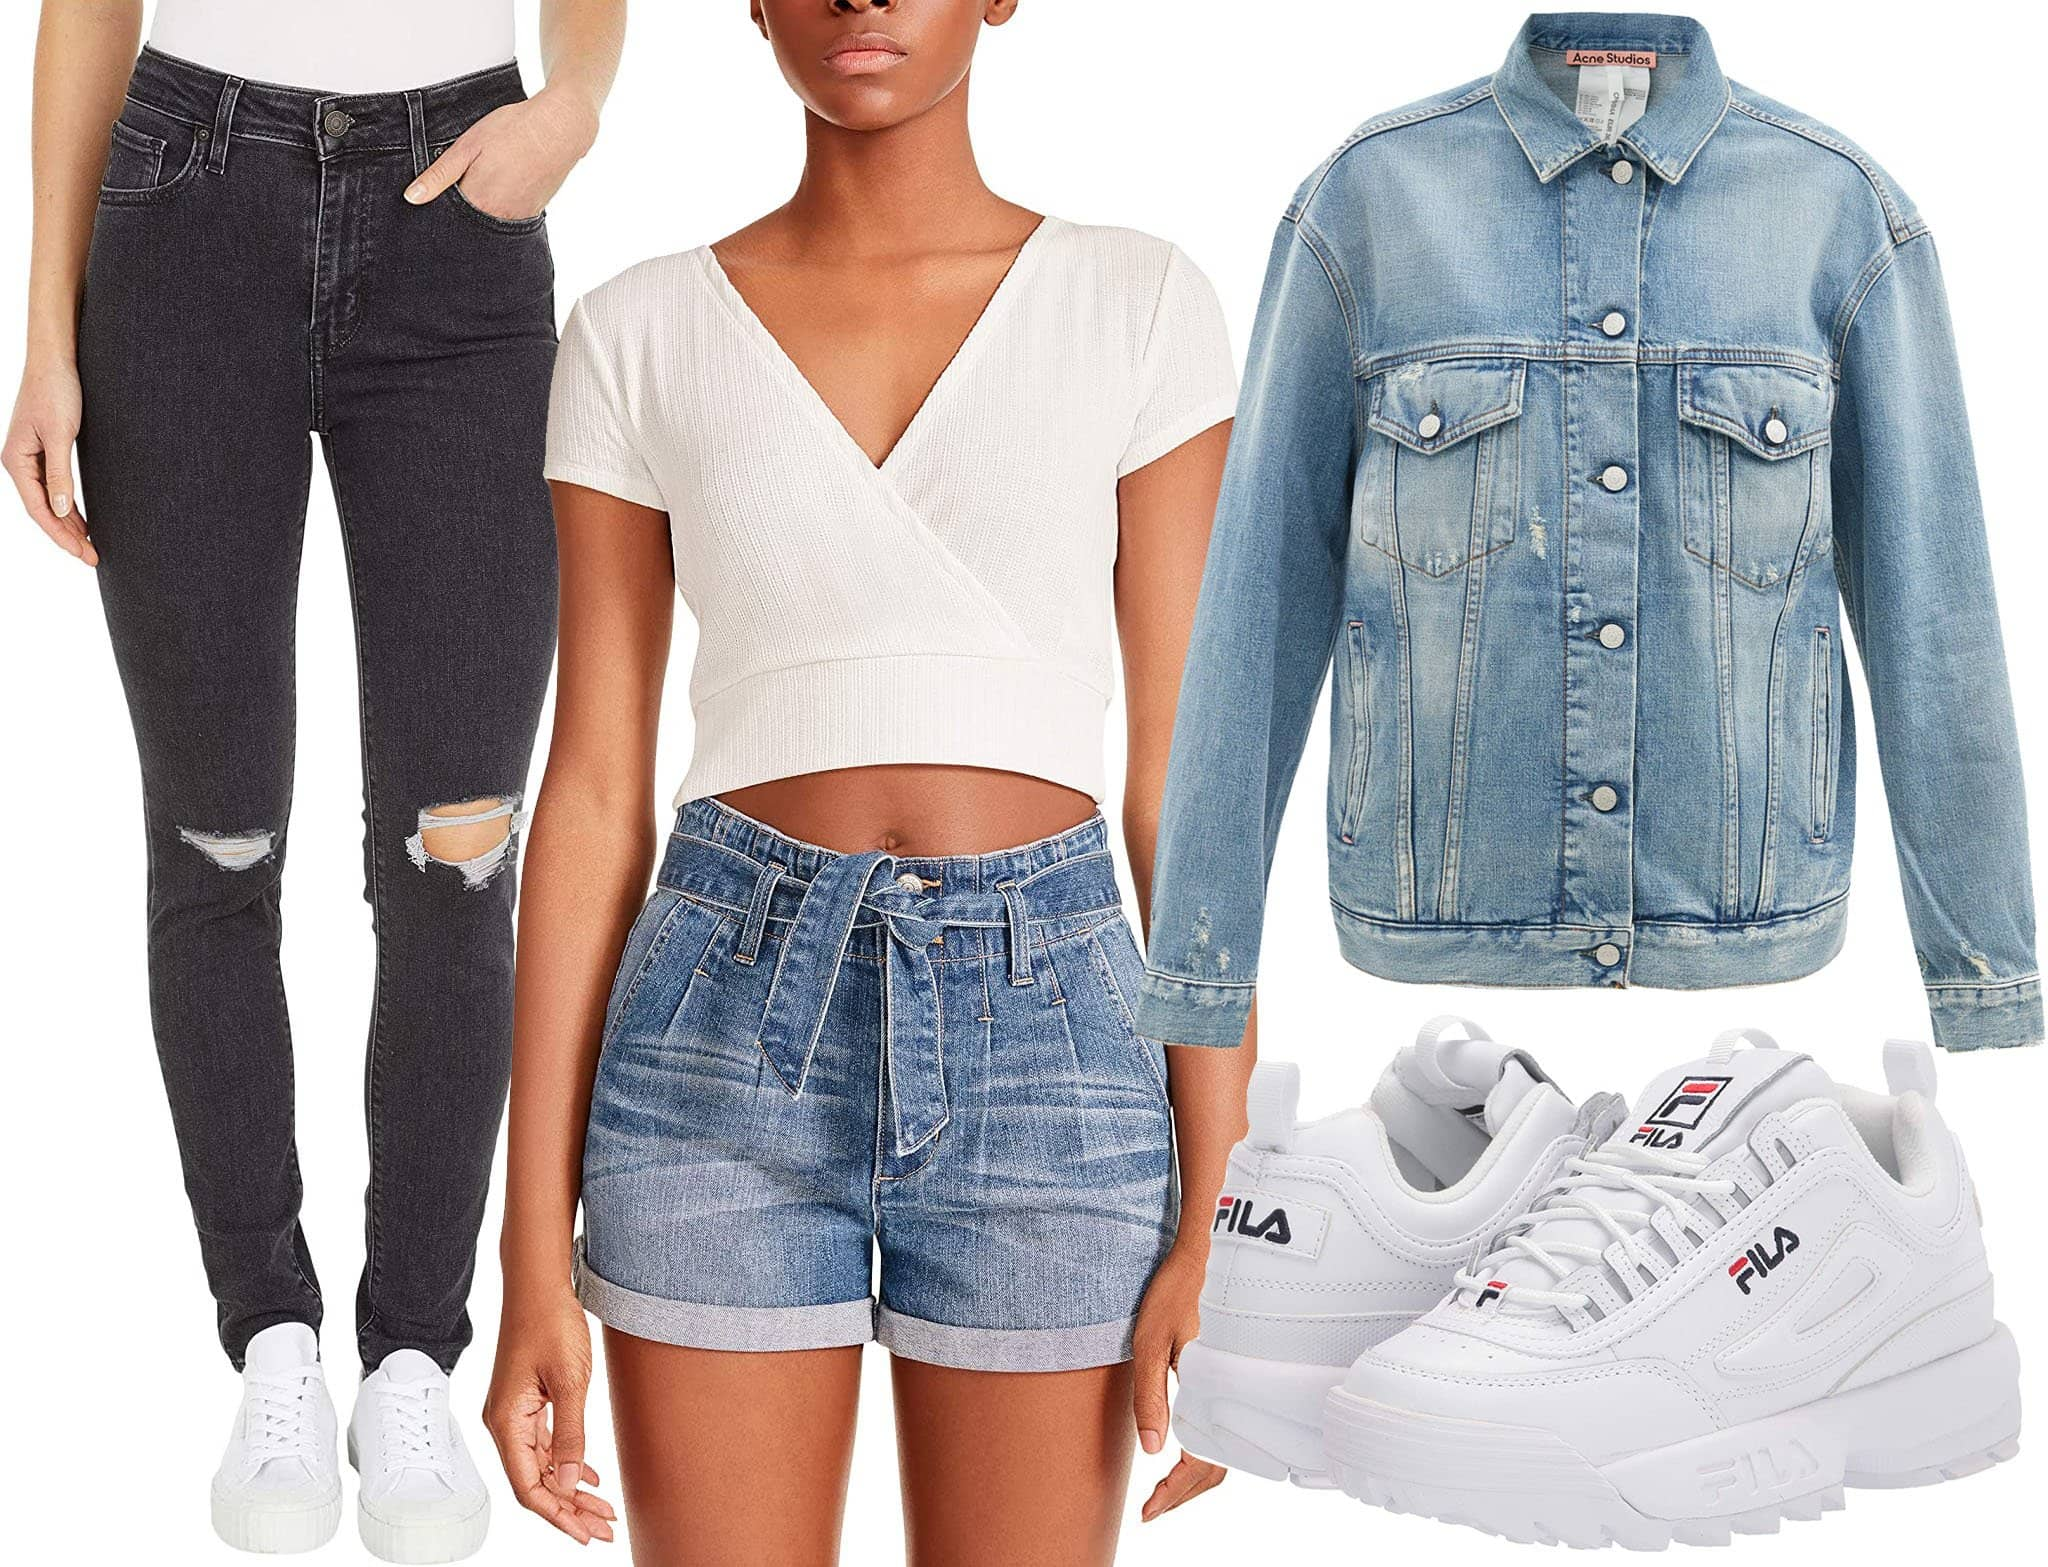 Levi's 721 High-Rise Skinny Jeans, Madden Girl Cropped Wrap Top, Acne Studios Oversized Distressed Denim Jacket, Fila Disruptor II Premium Sneakers